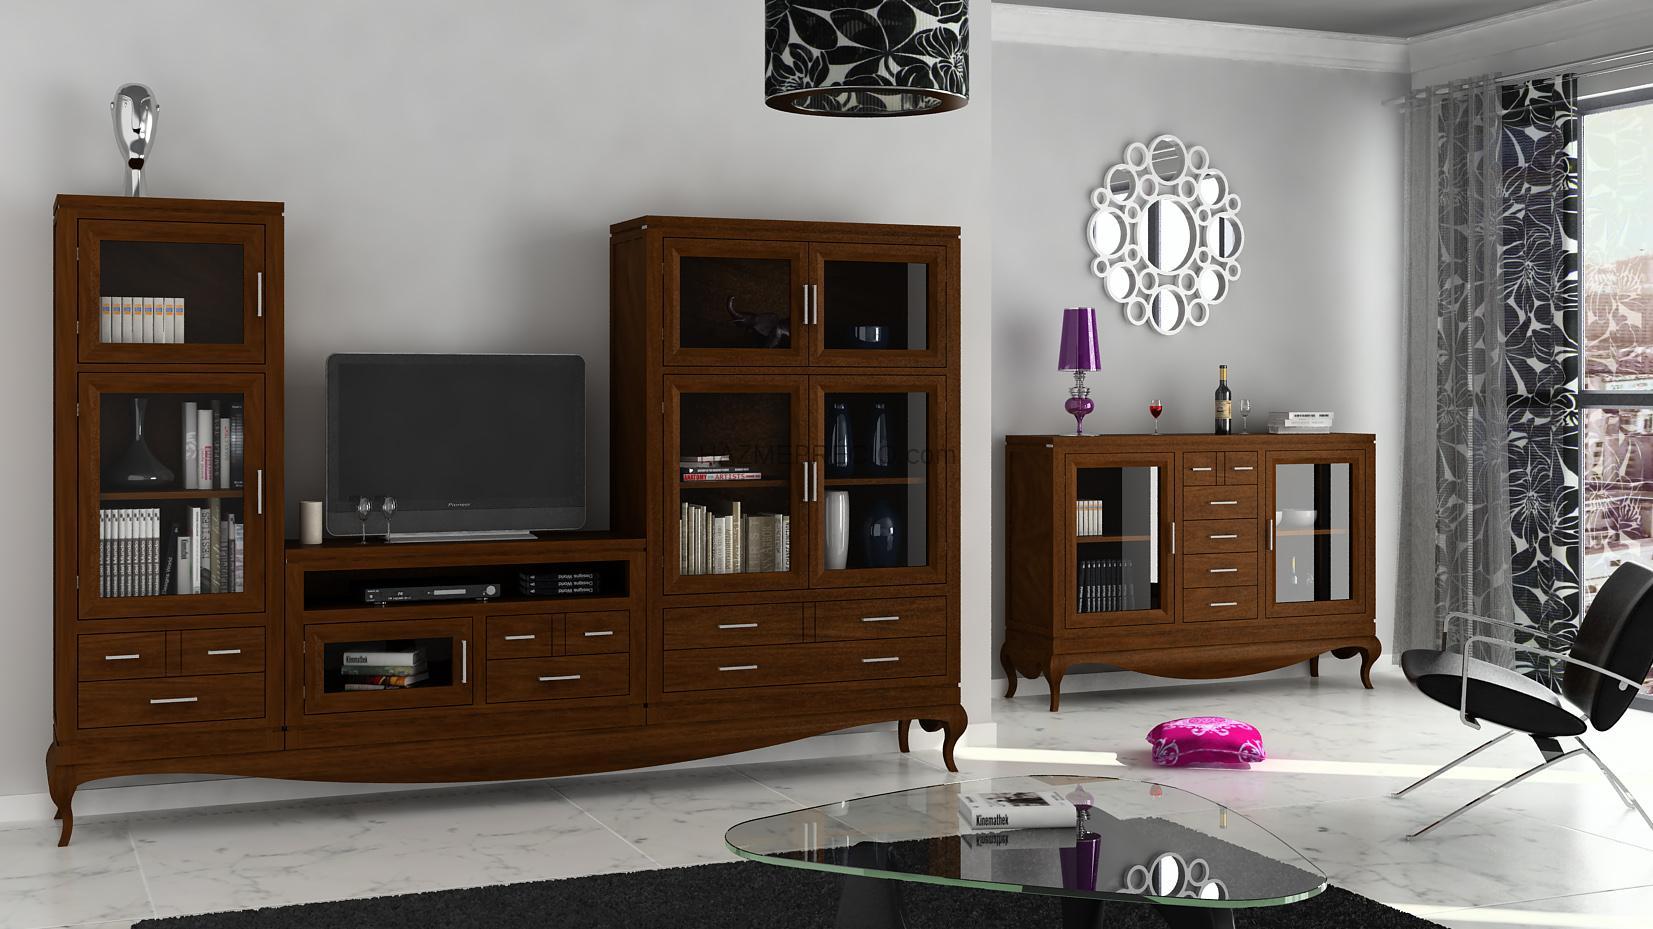 Empresas de muebles en cordoba for Muebles baratos cordoba